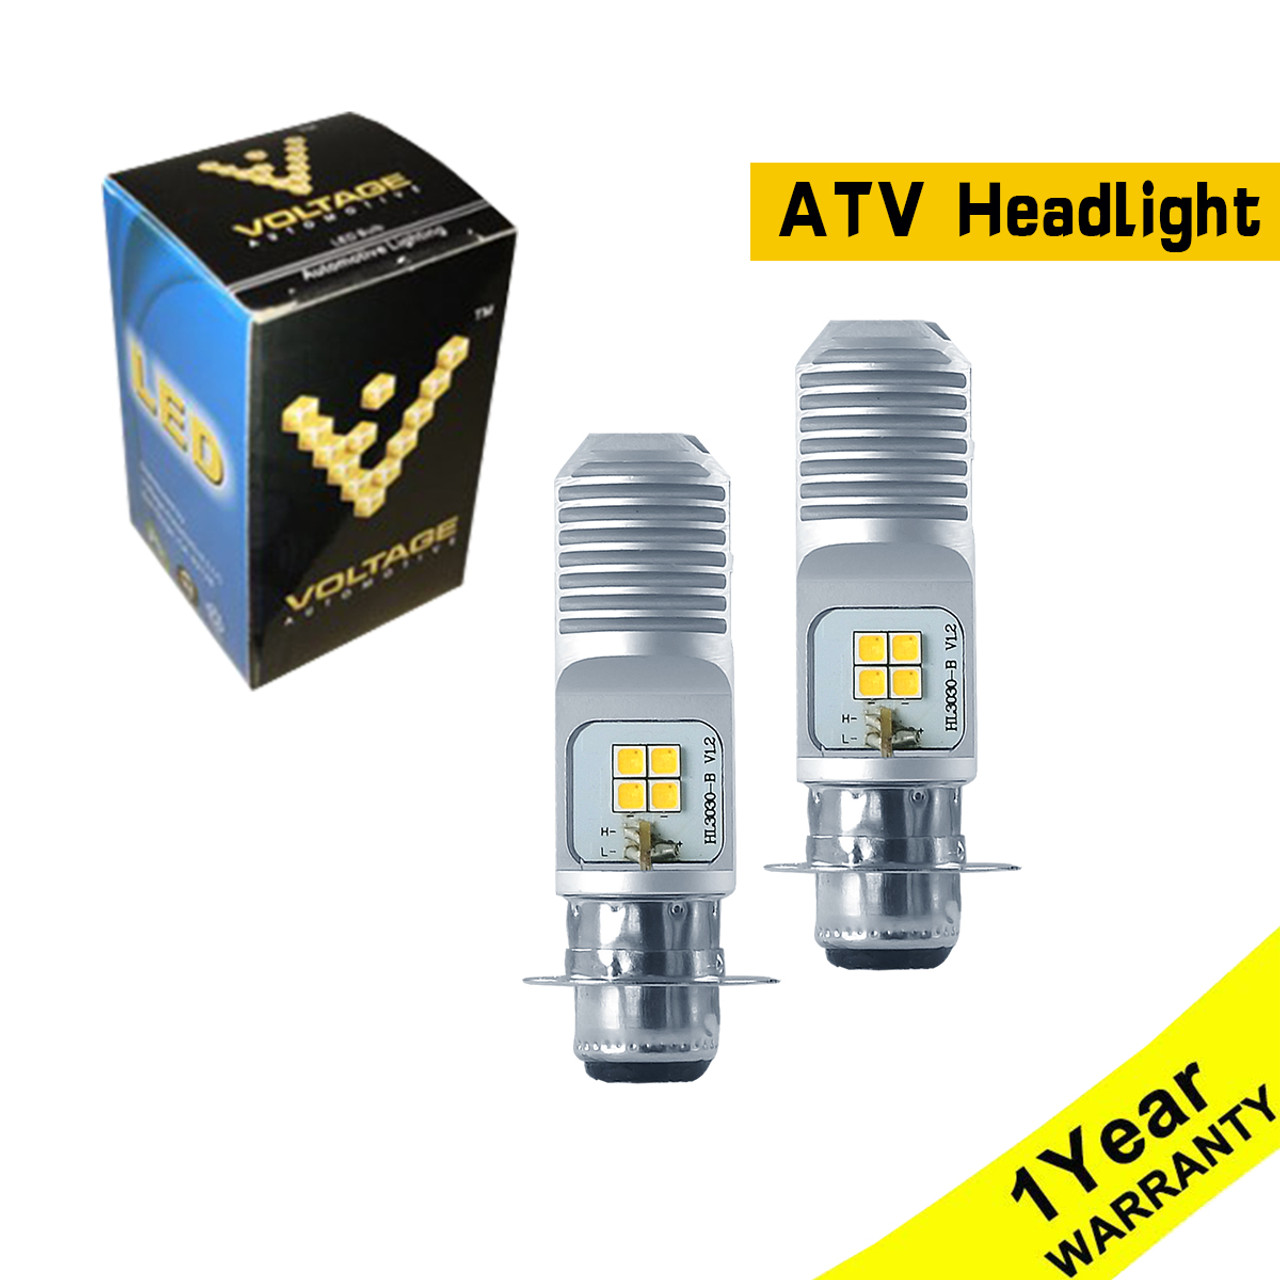 2Pcs White 34901-HR3-A21 Headlight LED Light Bulbs For TRX420 TRX500 2014-2018